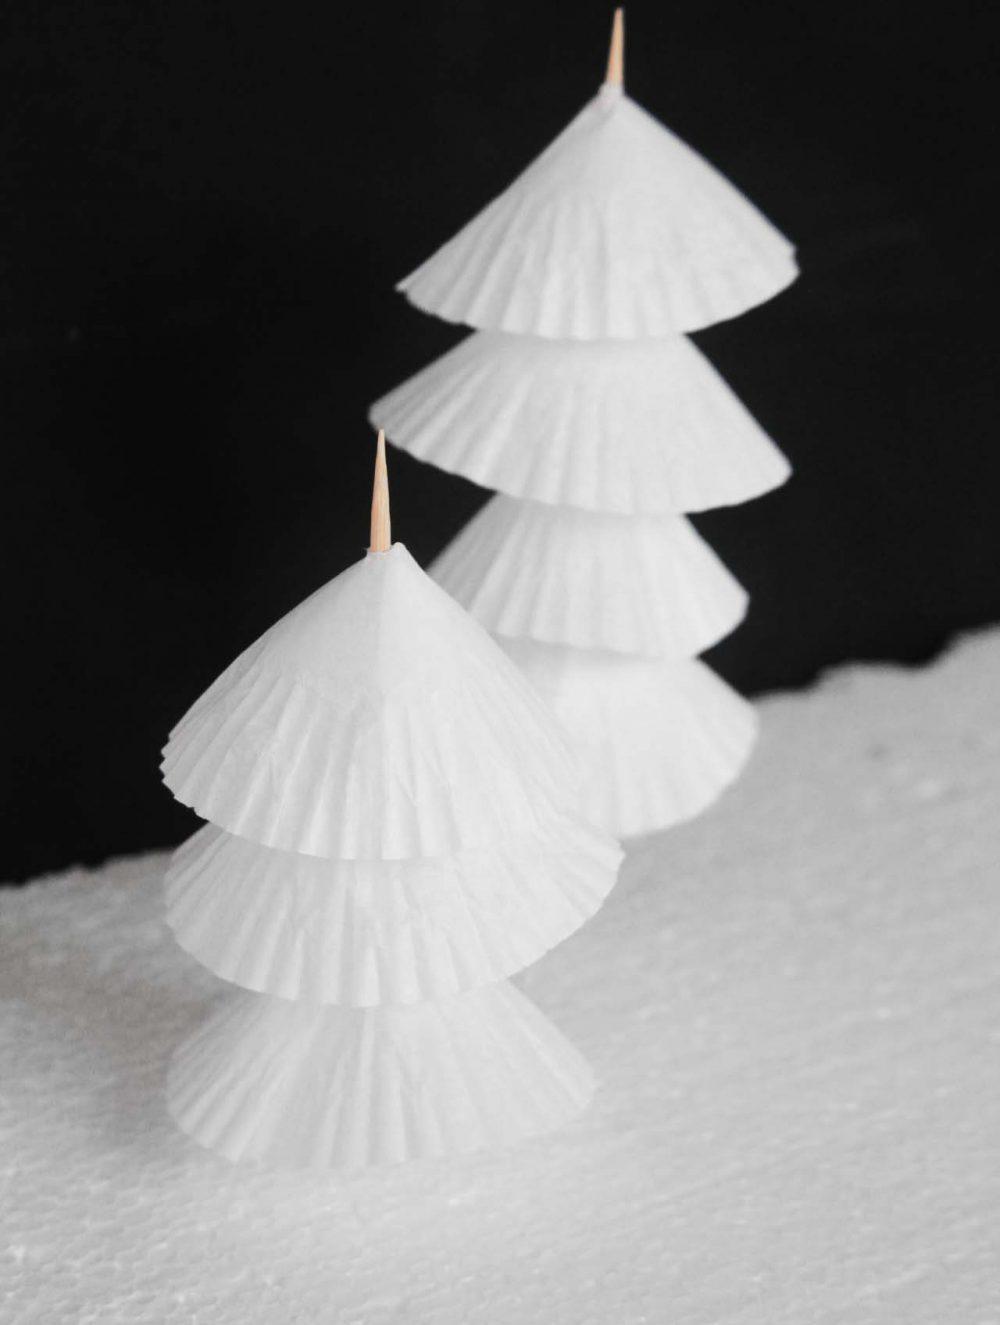 Make a paper Christmas tree